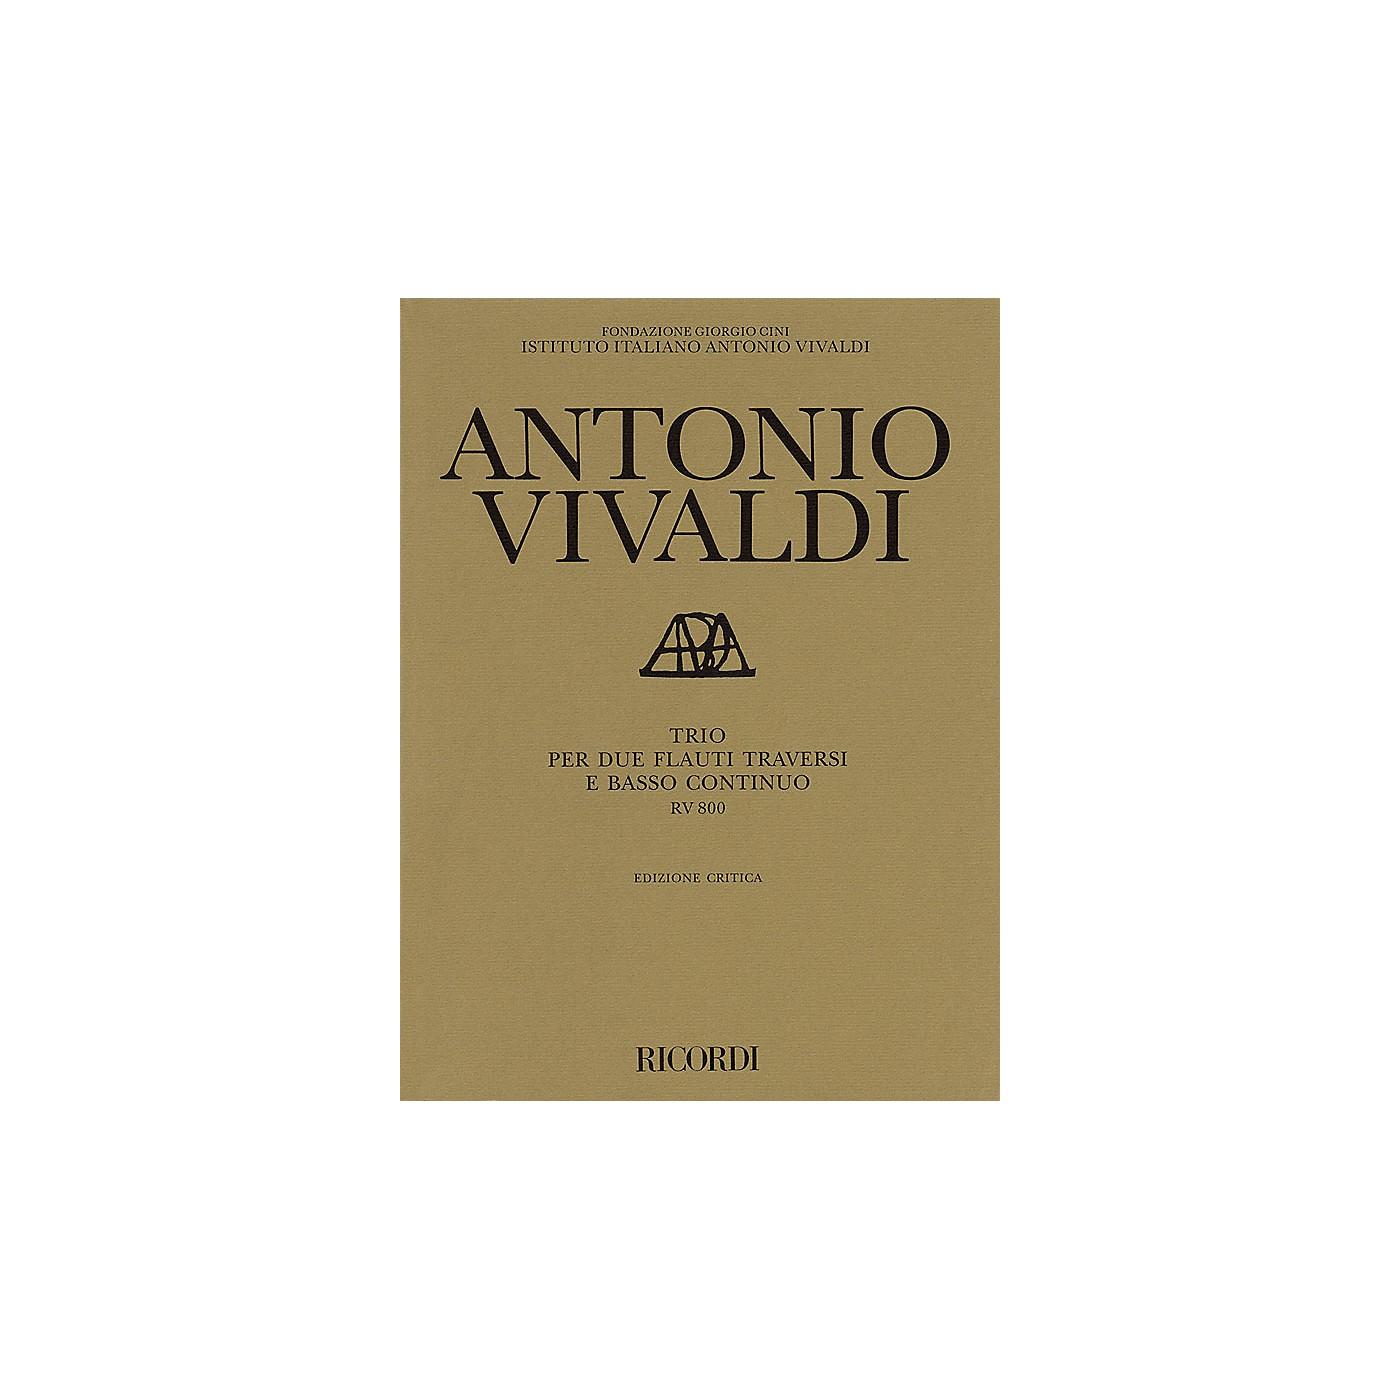 Ricordi Trio for 2 Transverse Flutes and Basso Continuo RV800 Ensemble Series by Antonio Vivaldi thumbnail